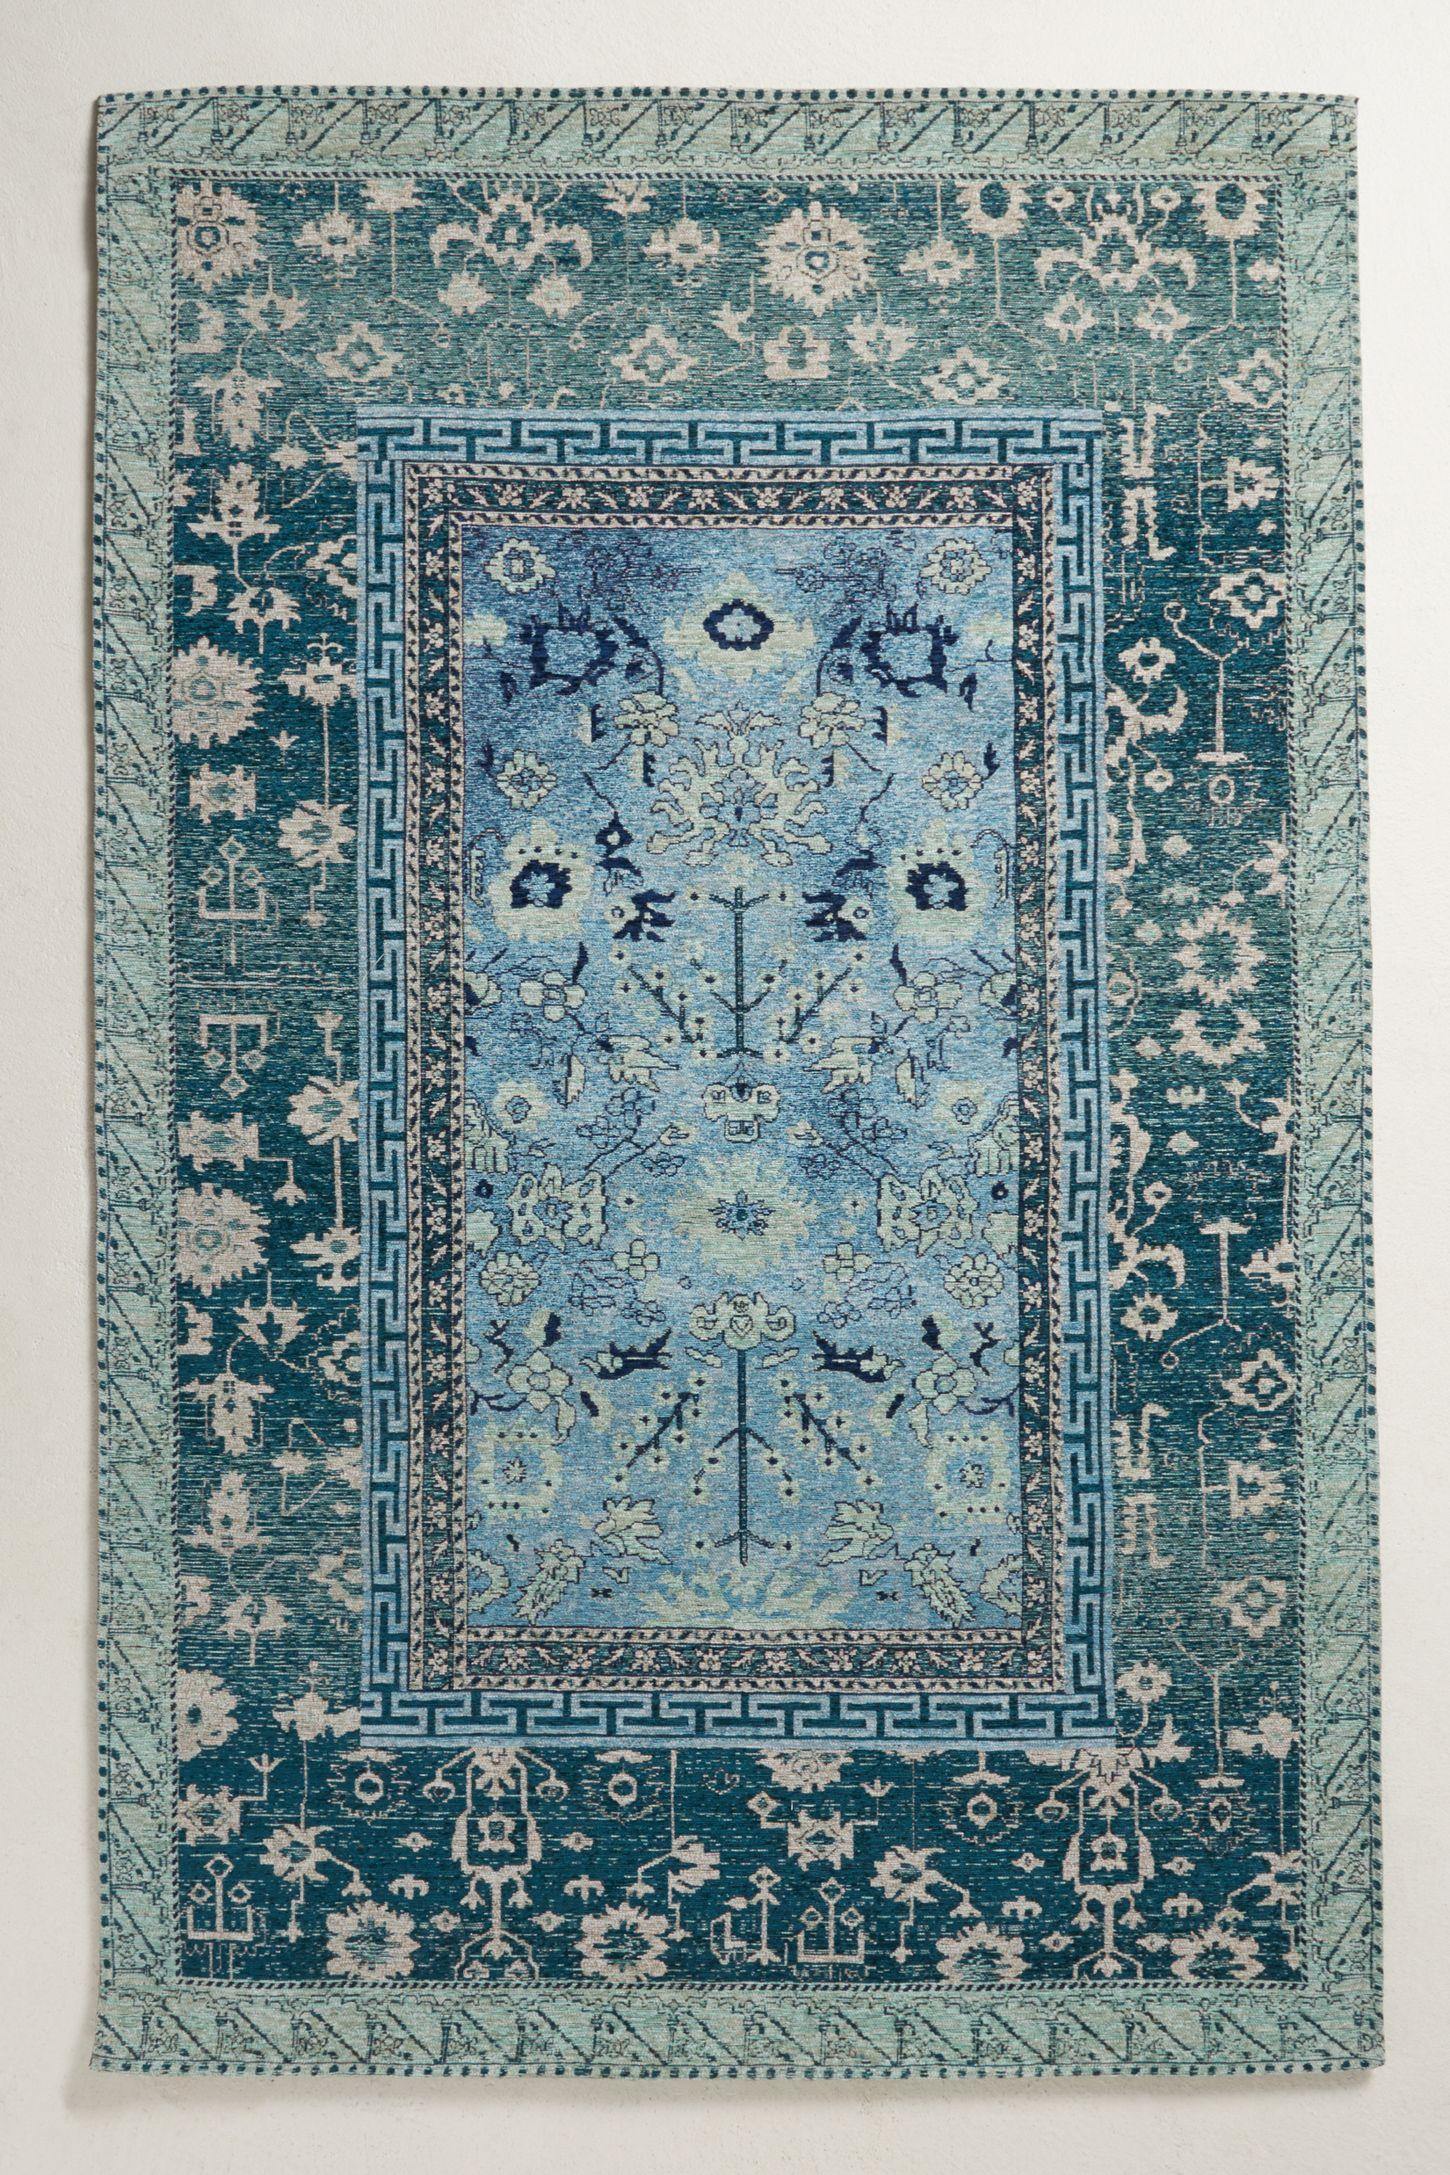 rugs | area rugs, doormats, moroccan rugs | anthropologie